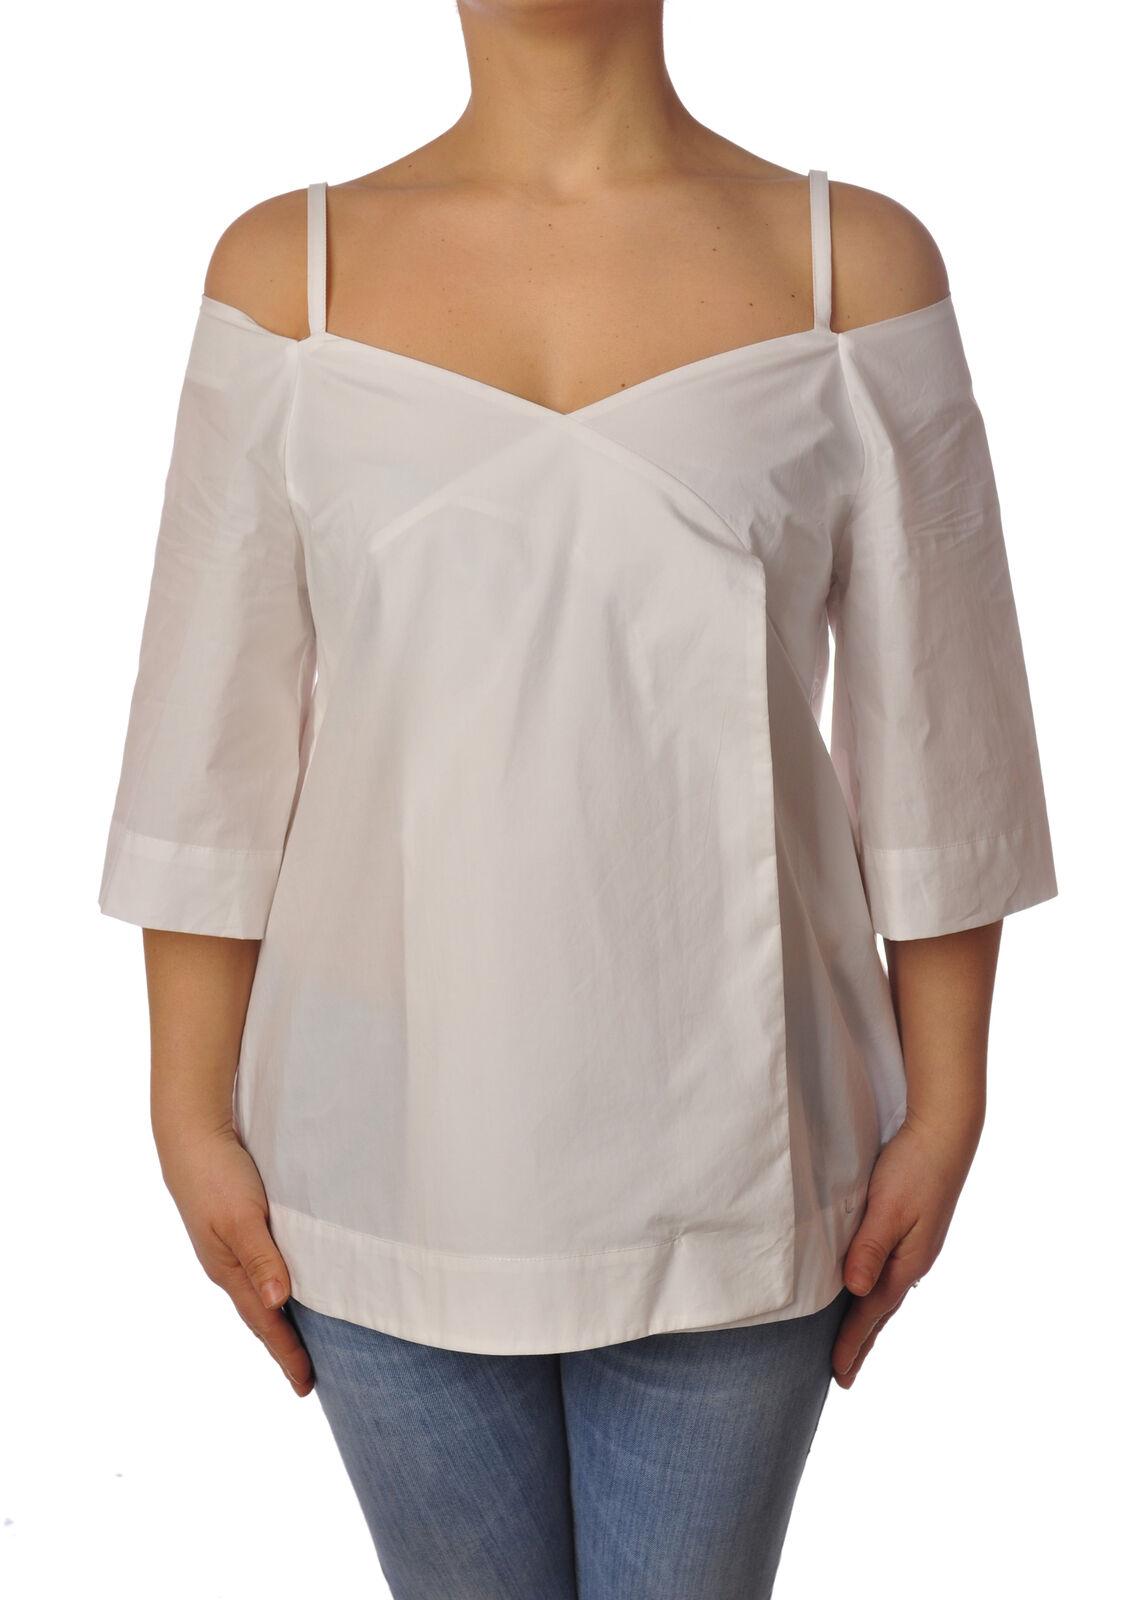 Ottod'ame - Shirts-Blouses - Woman - Weiß - 4958321G184911